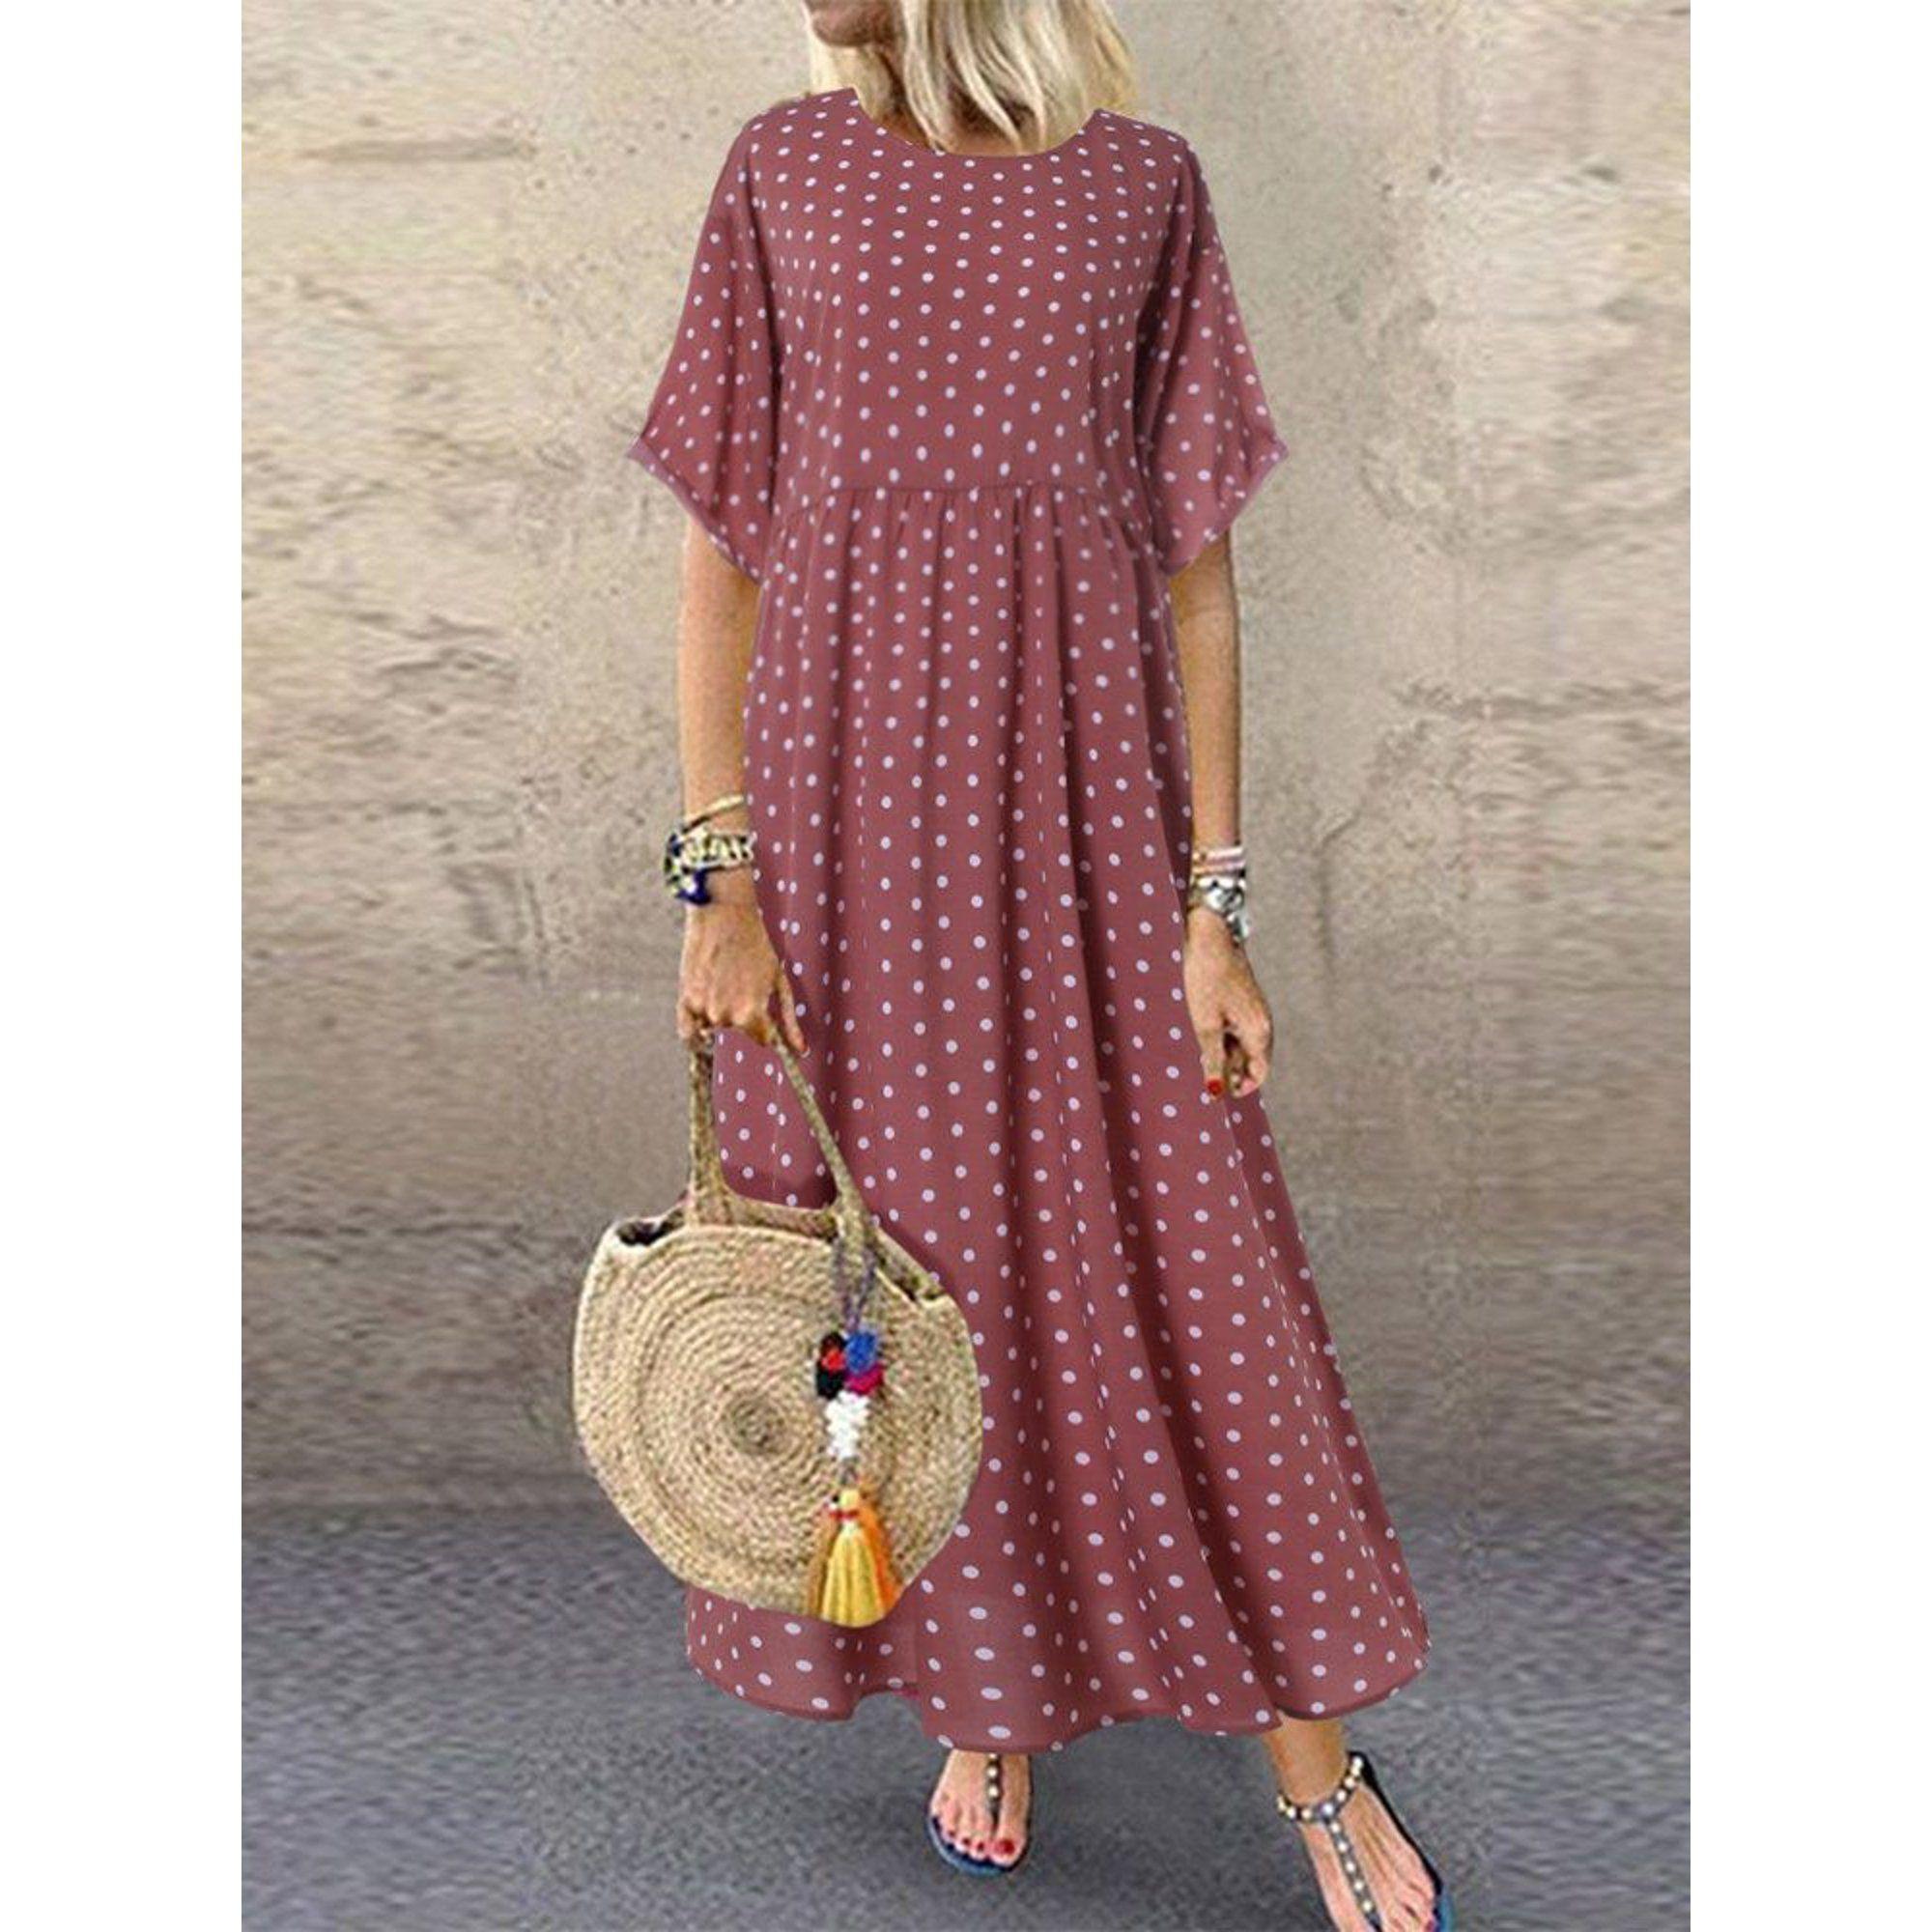 Side Women S Dress Polka Dot Small Fresh Large Size Dress Walmart Com Plus Size Maxi Dresses Maxi Dress With Sleeves Short Sleeve Maxi Dresses [ 2000 x 2000 Pixel ]